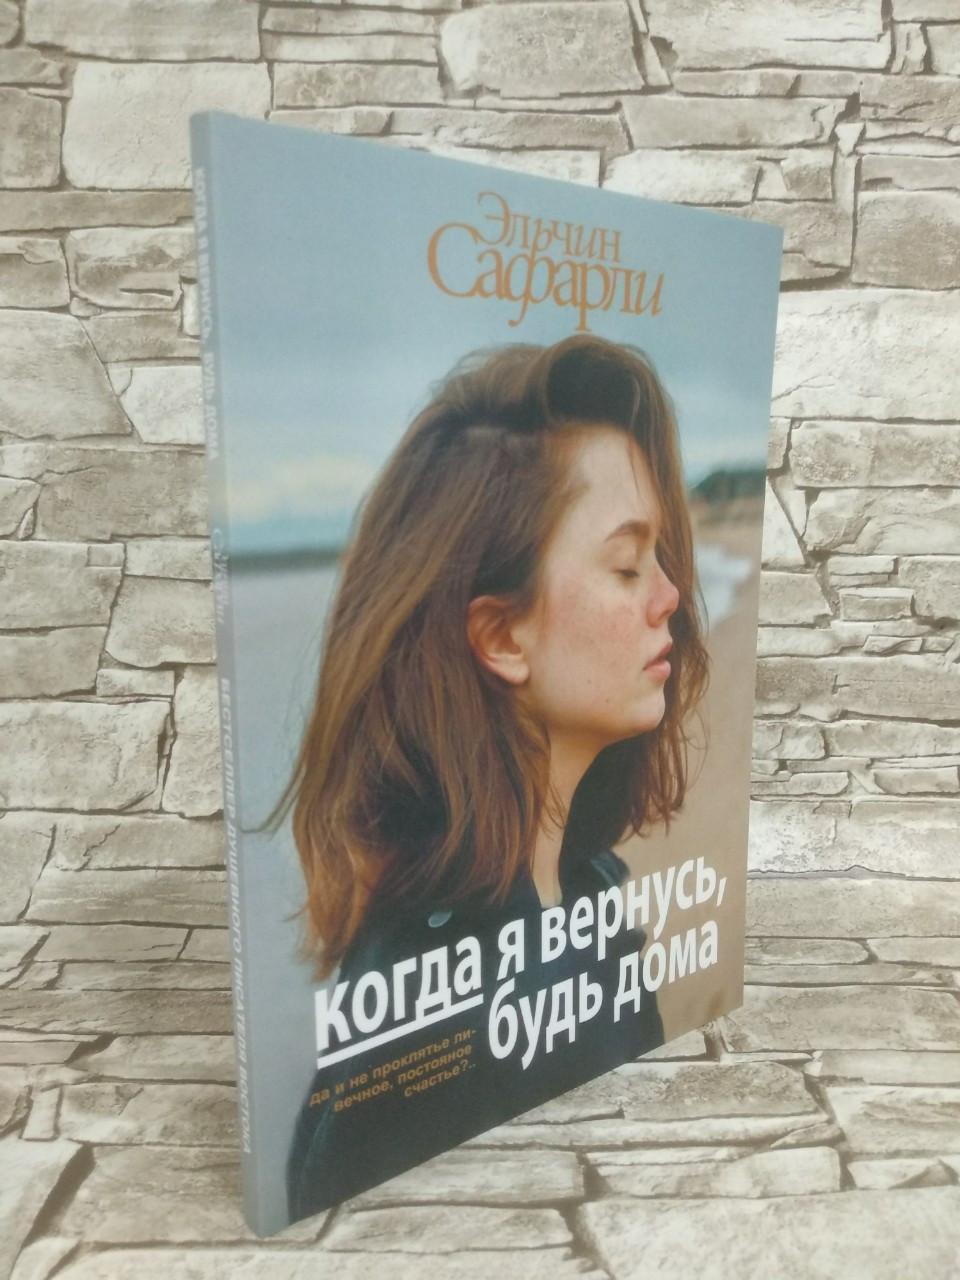 "Книга ""Коли я повернуся, будь дому"" Ельчин Сафарли. Бестселер!"